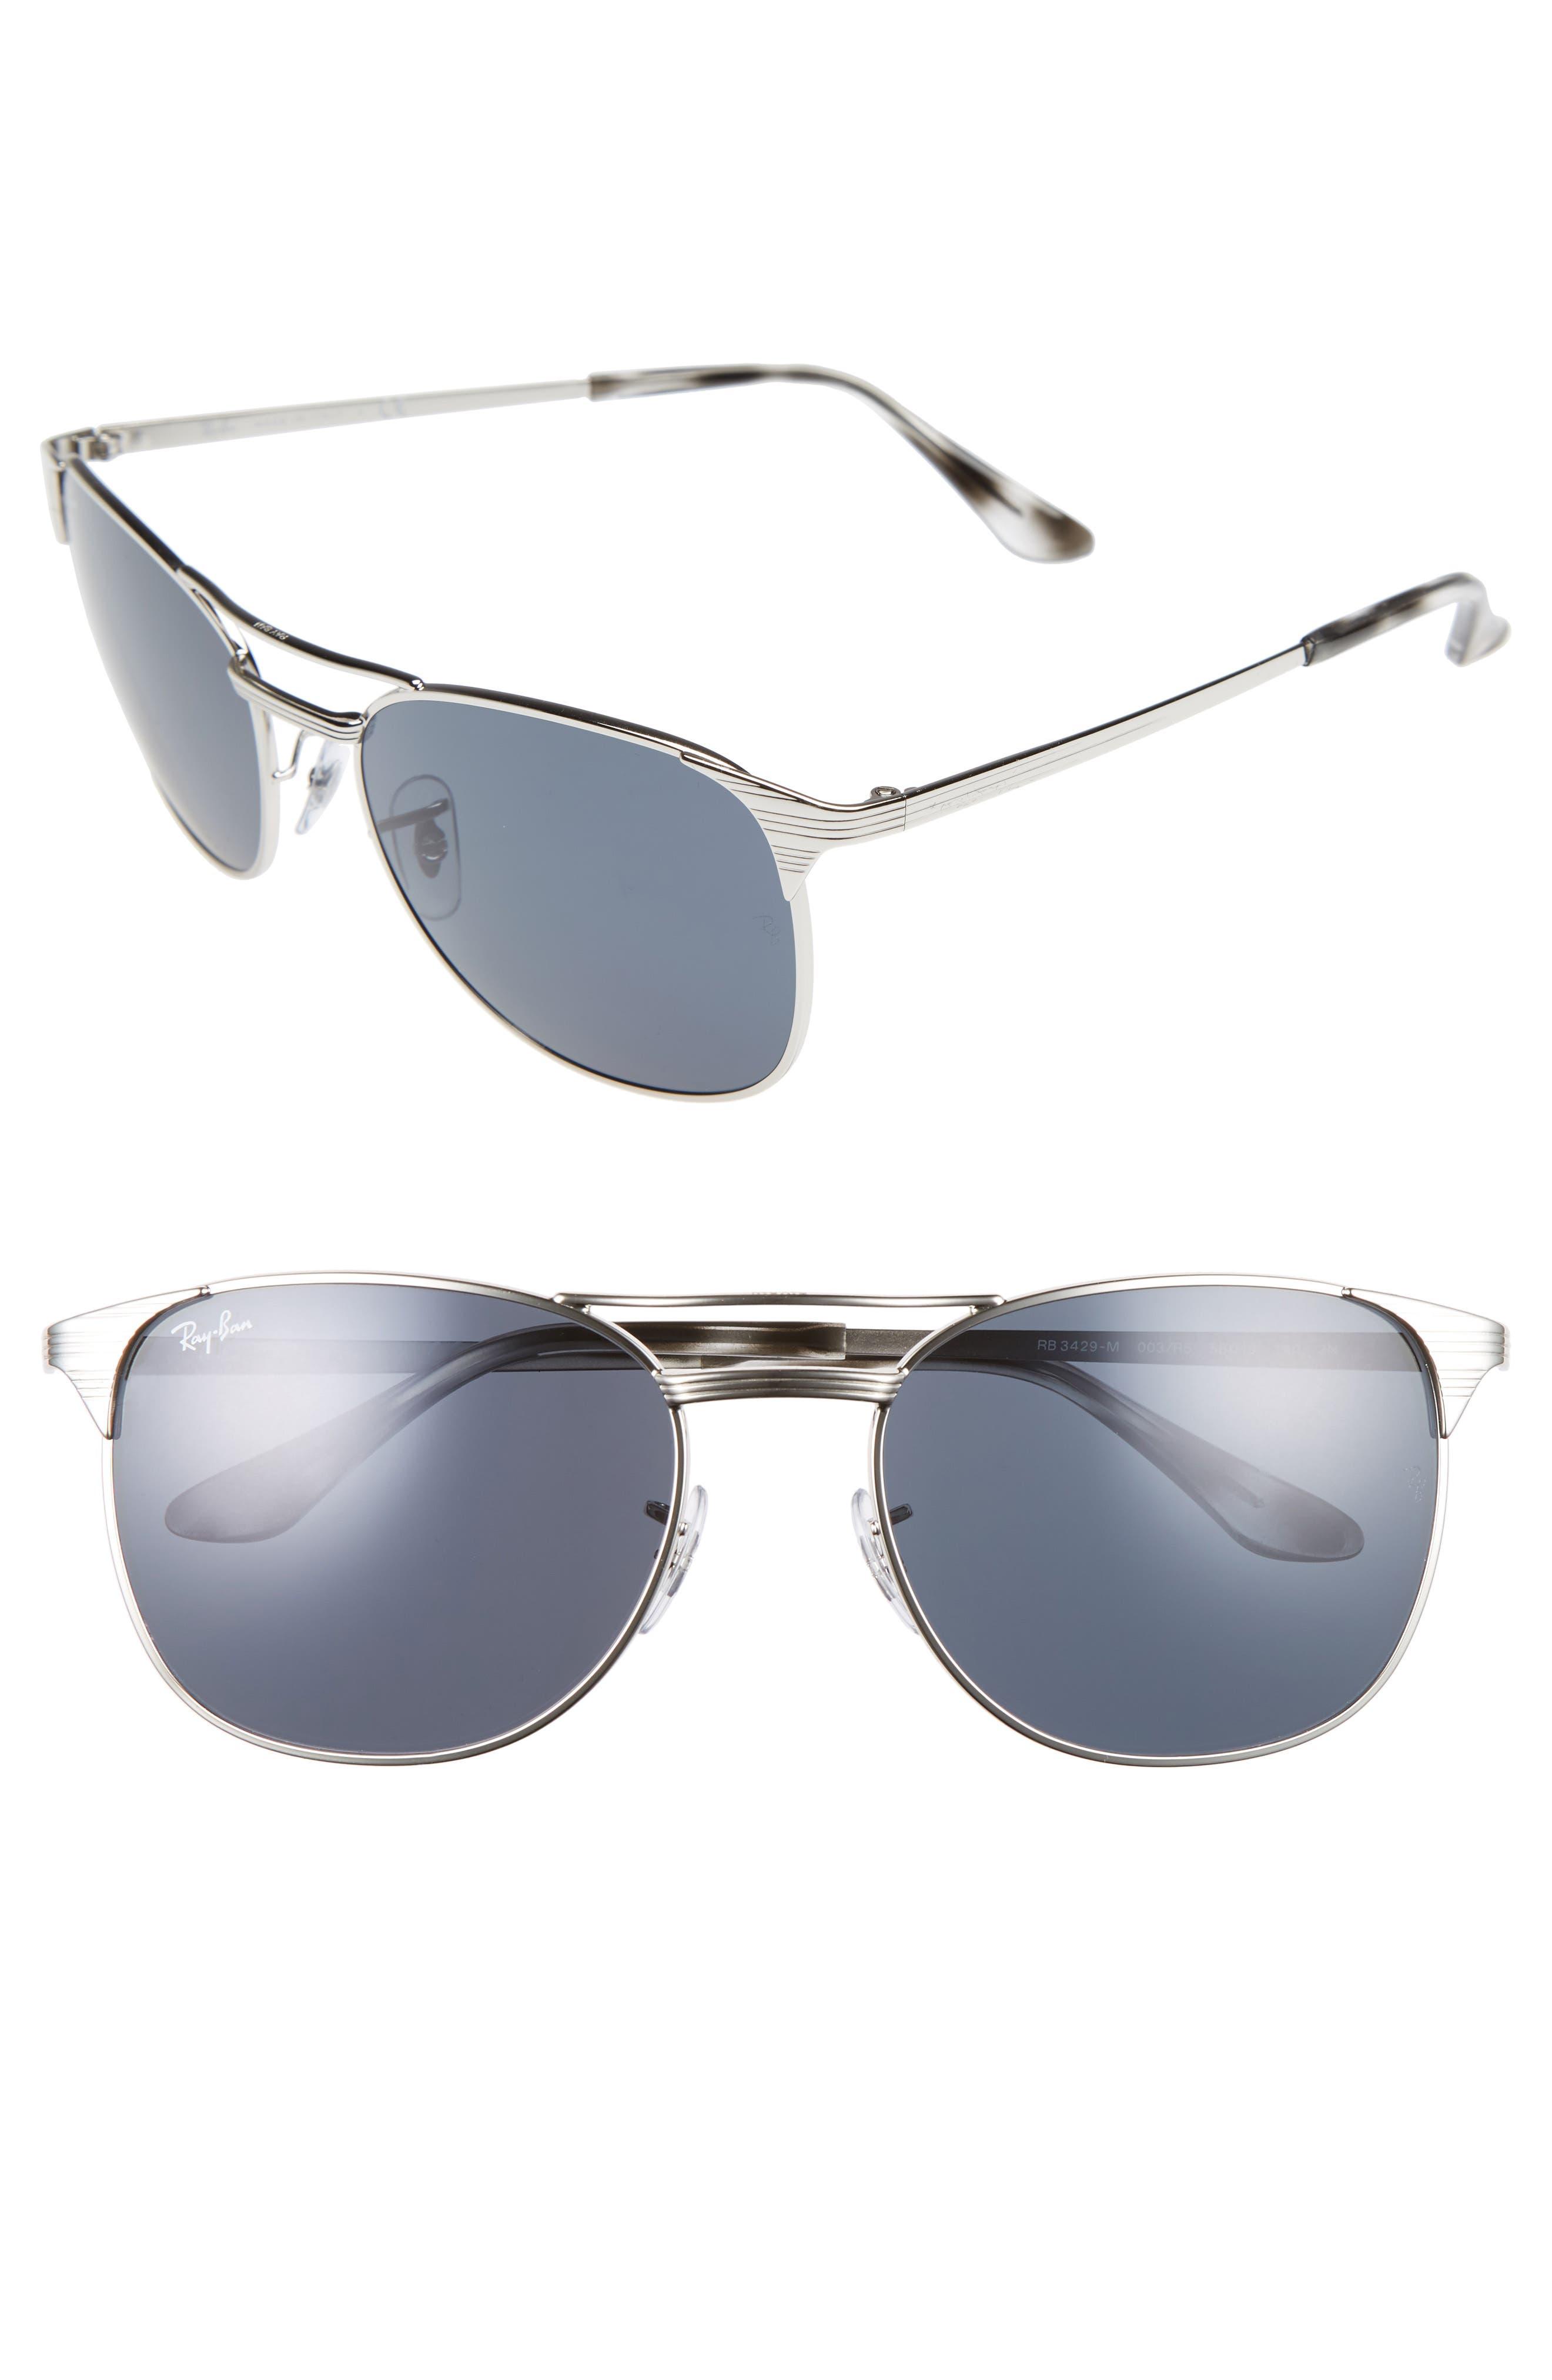 Ray-Ban Signet 5m Square Sunglasses -